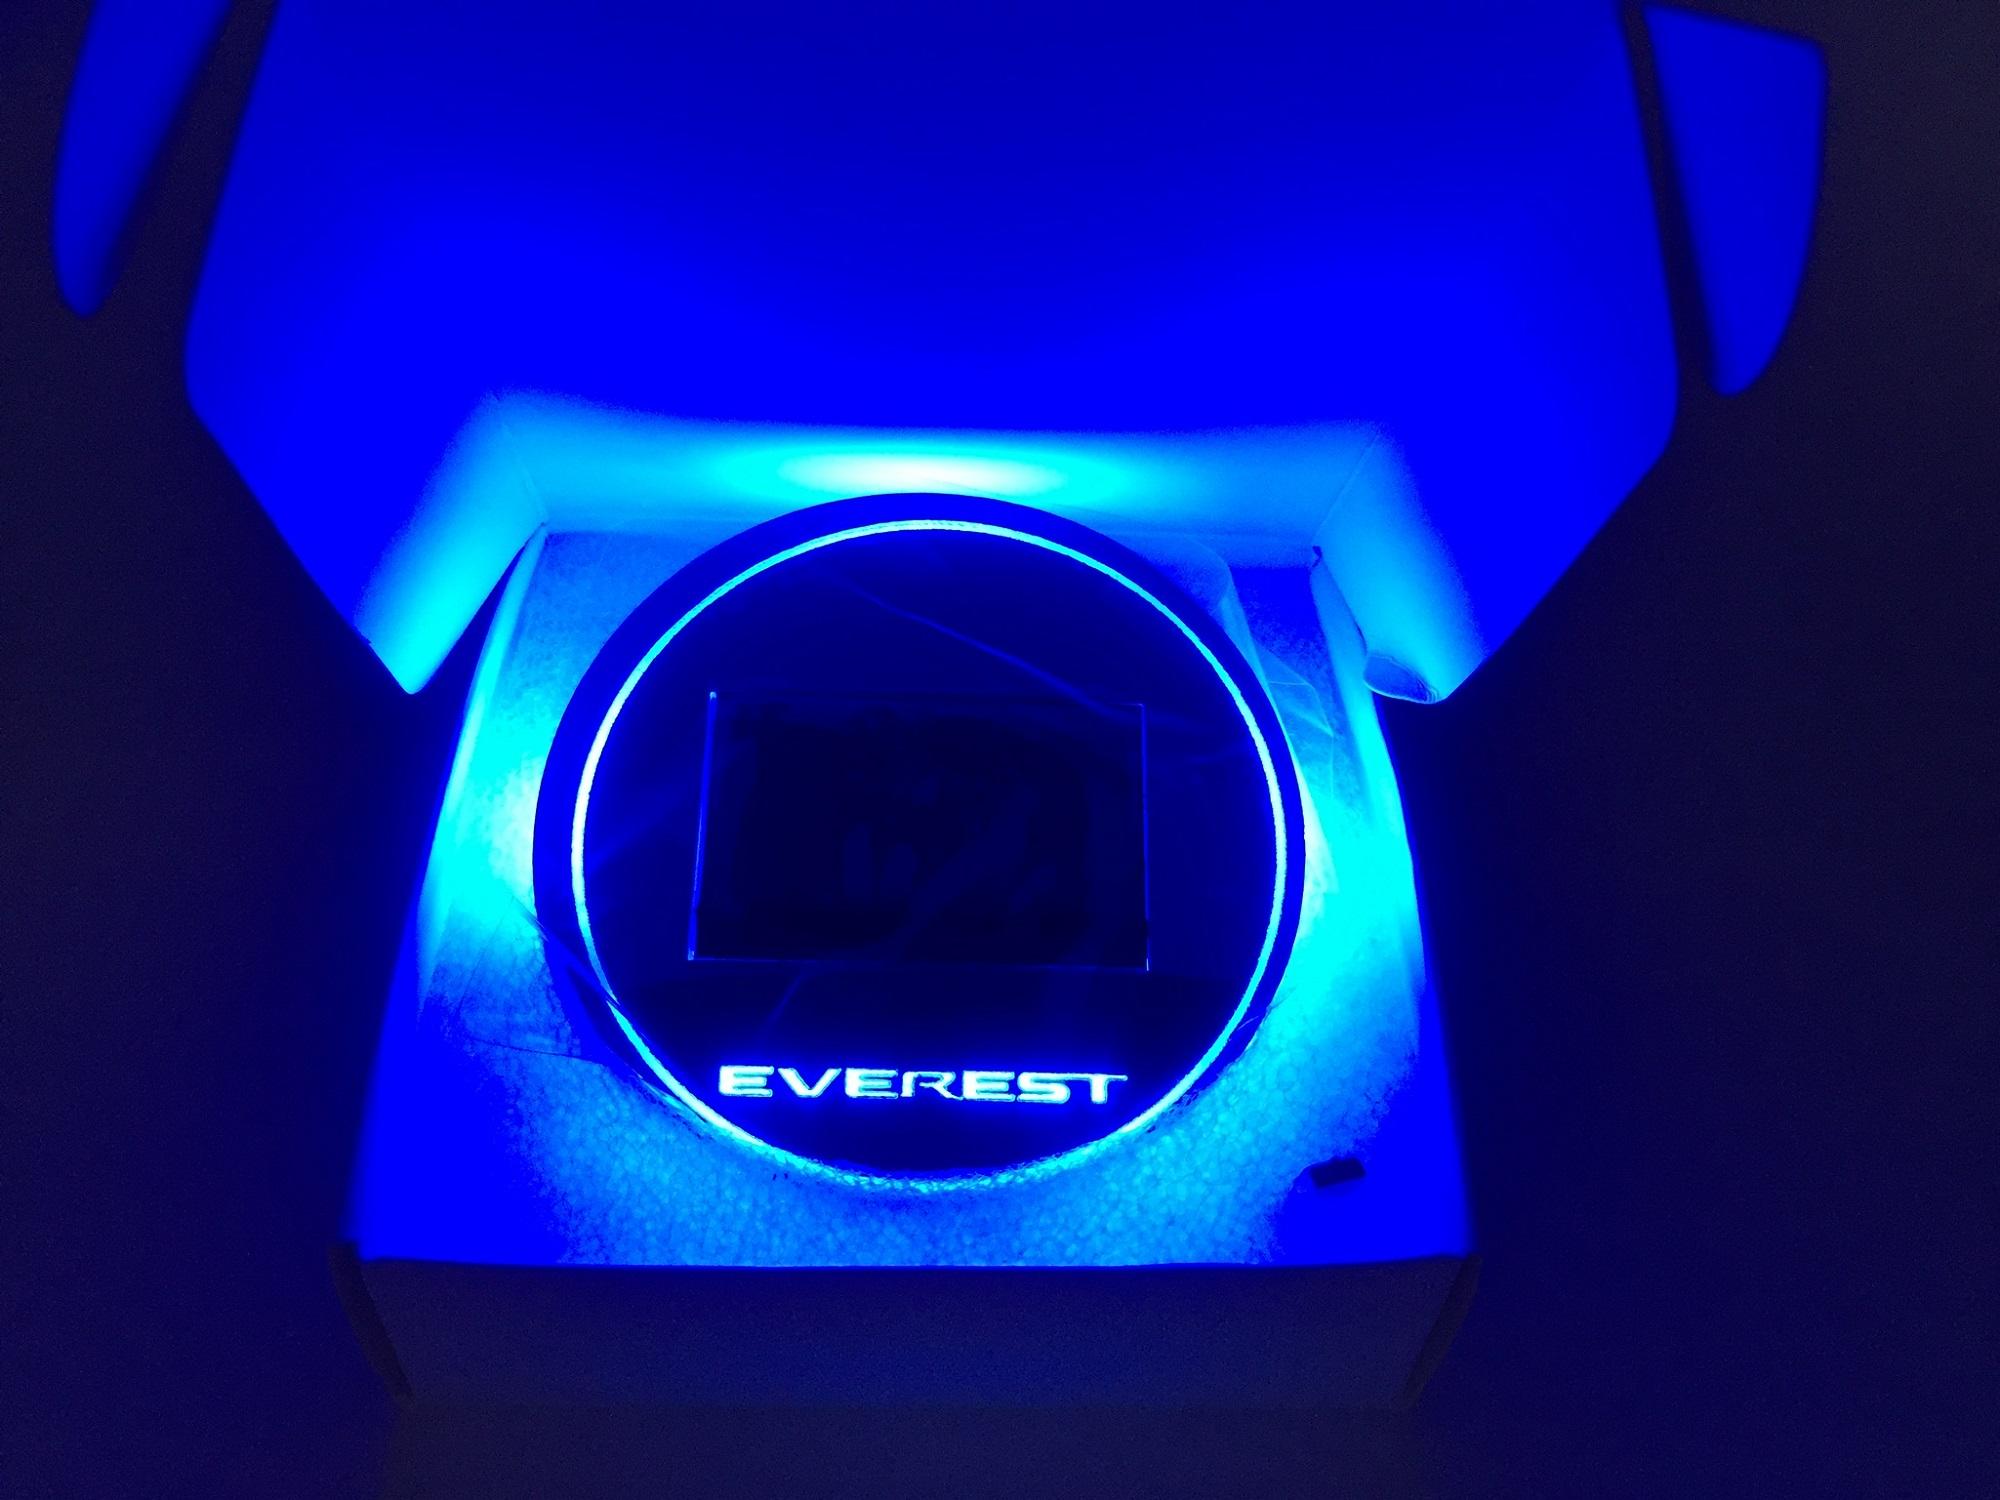 LED Cup Holder รองแก้วมีไฟ Everest